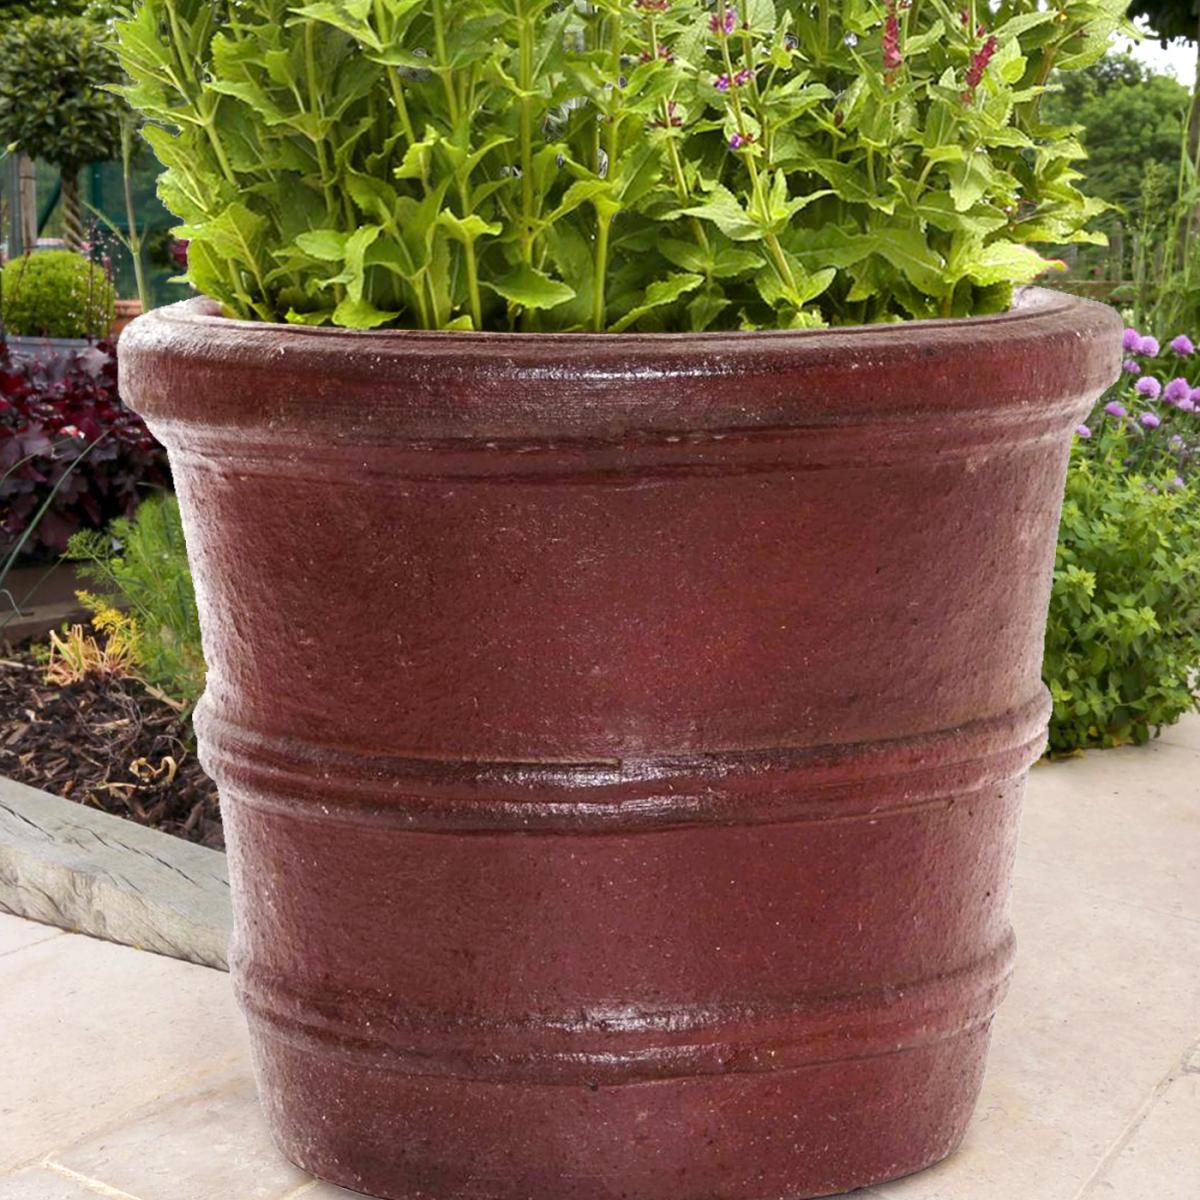 buy garden pots online uk balcony plant pots ikea balcony. Black Bedroom Furniture Sets. Home Design Ideas